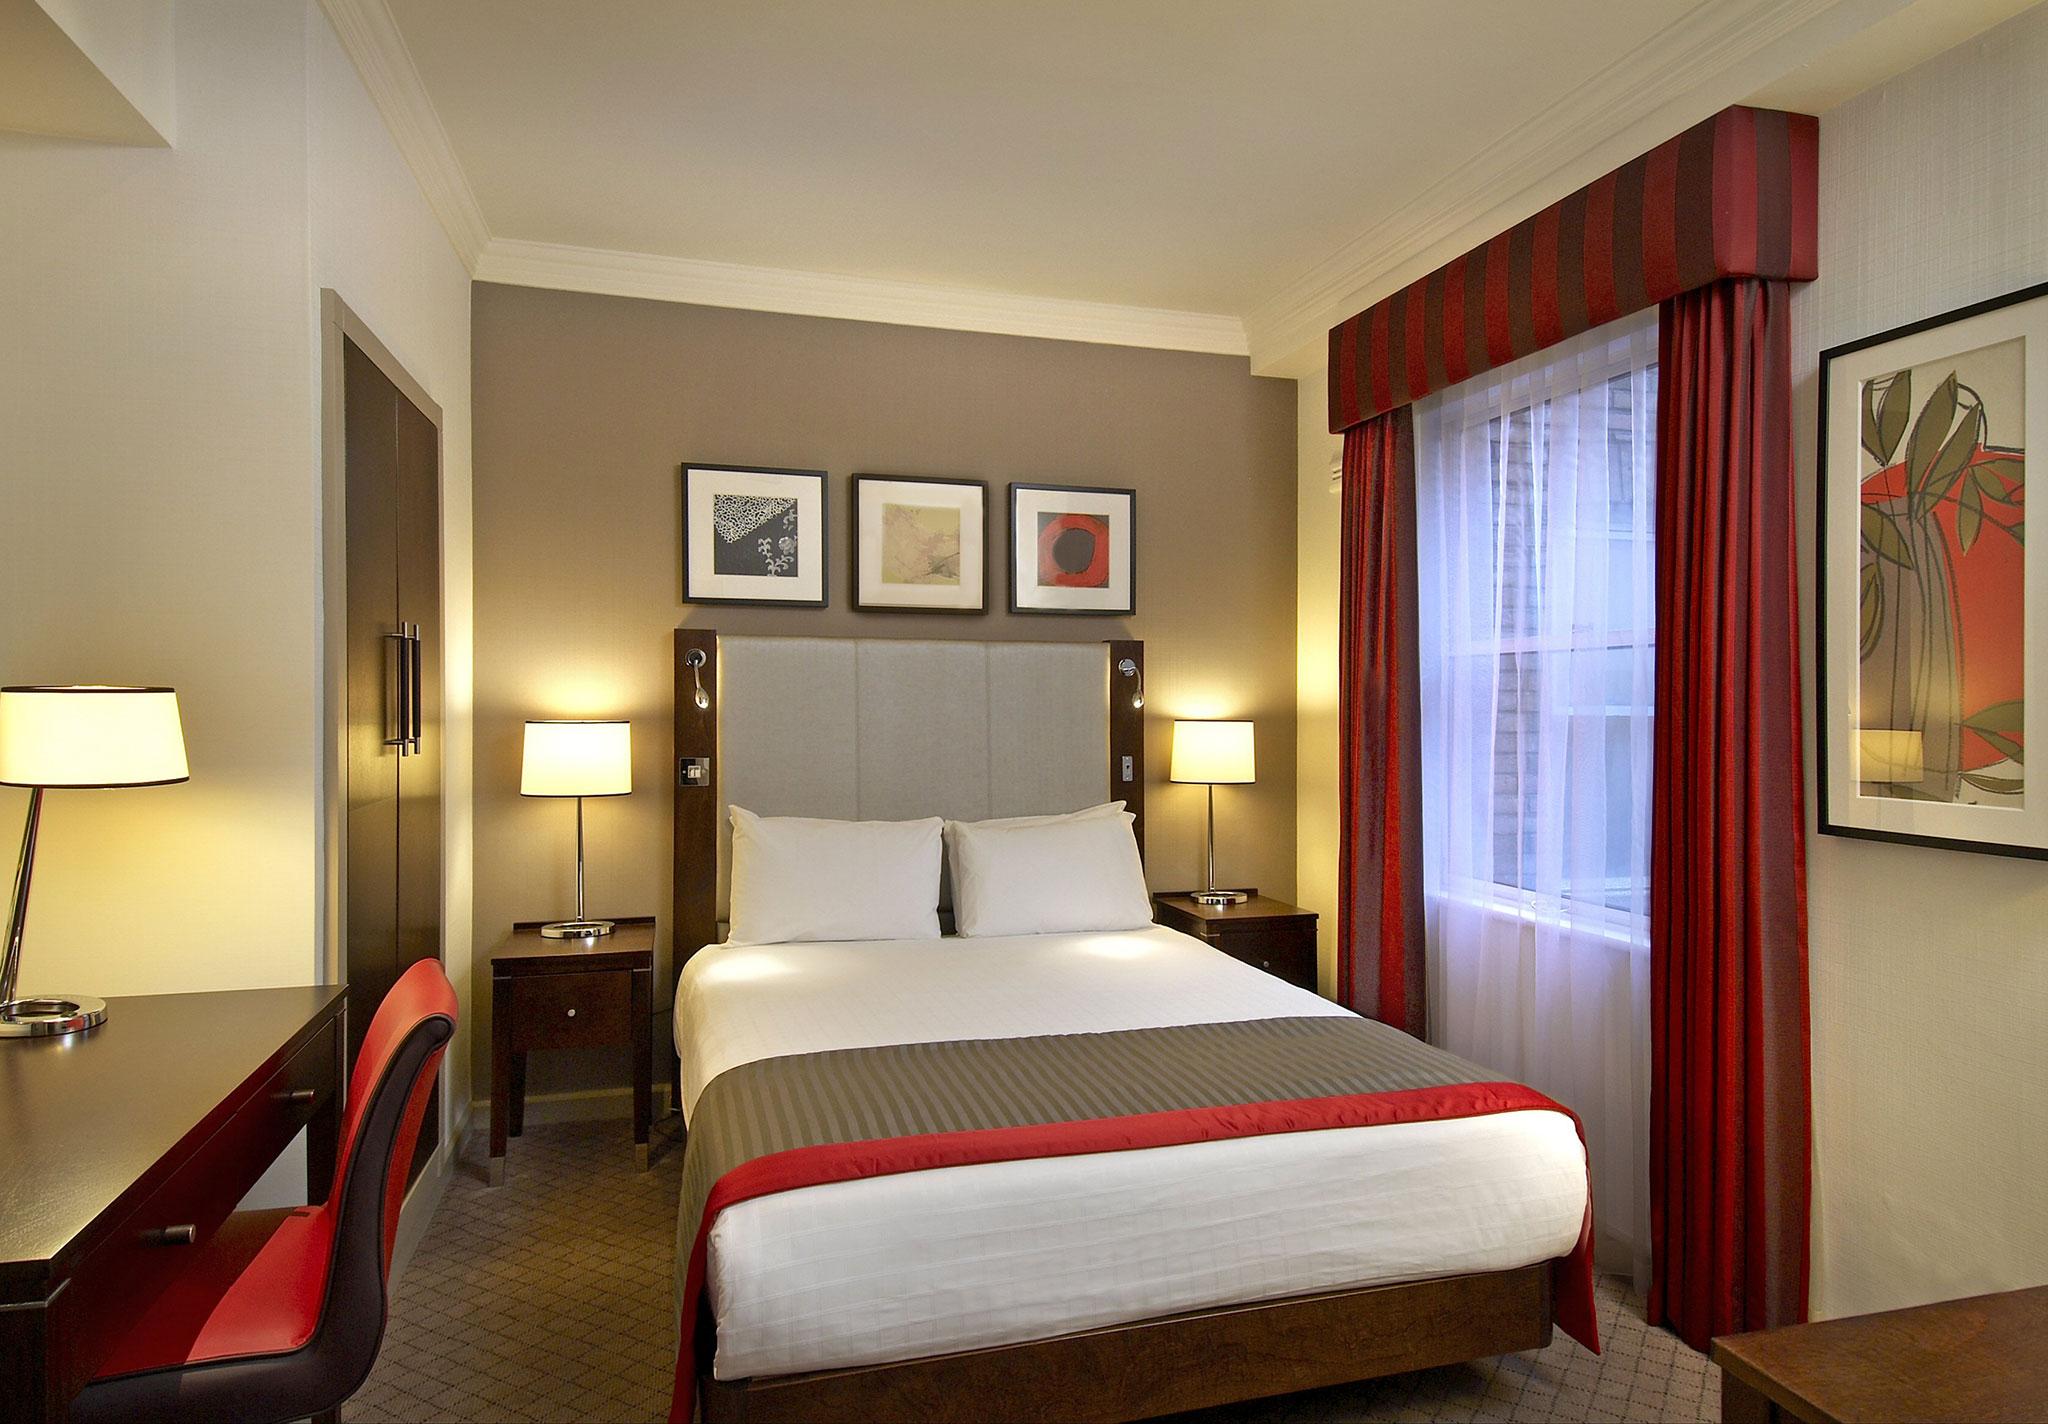 http://www.hiltonhotels.com/assets/img/hotels/LONGPTW_Hilton_London_Green_Park/IT/LONGPTW_rooms_full01_dbldlxplus04.jpg